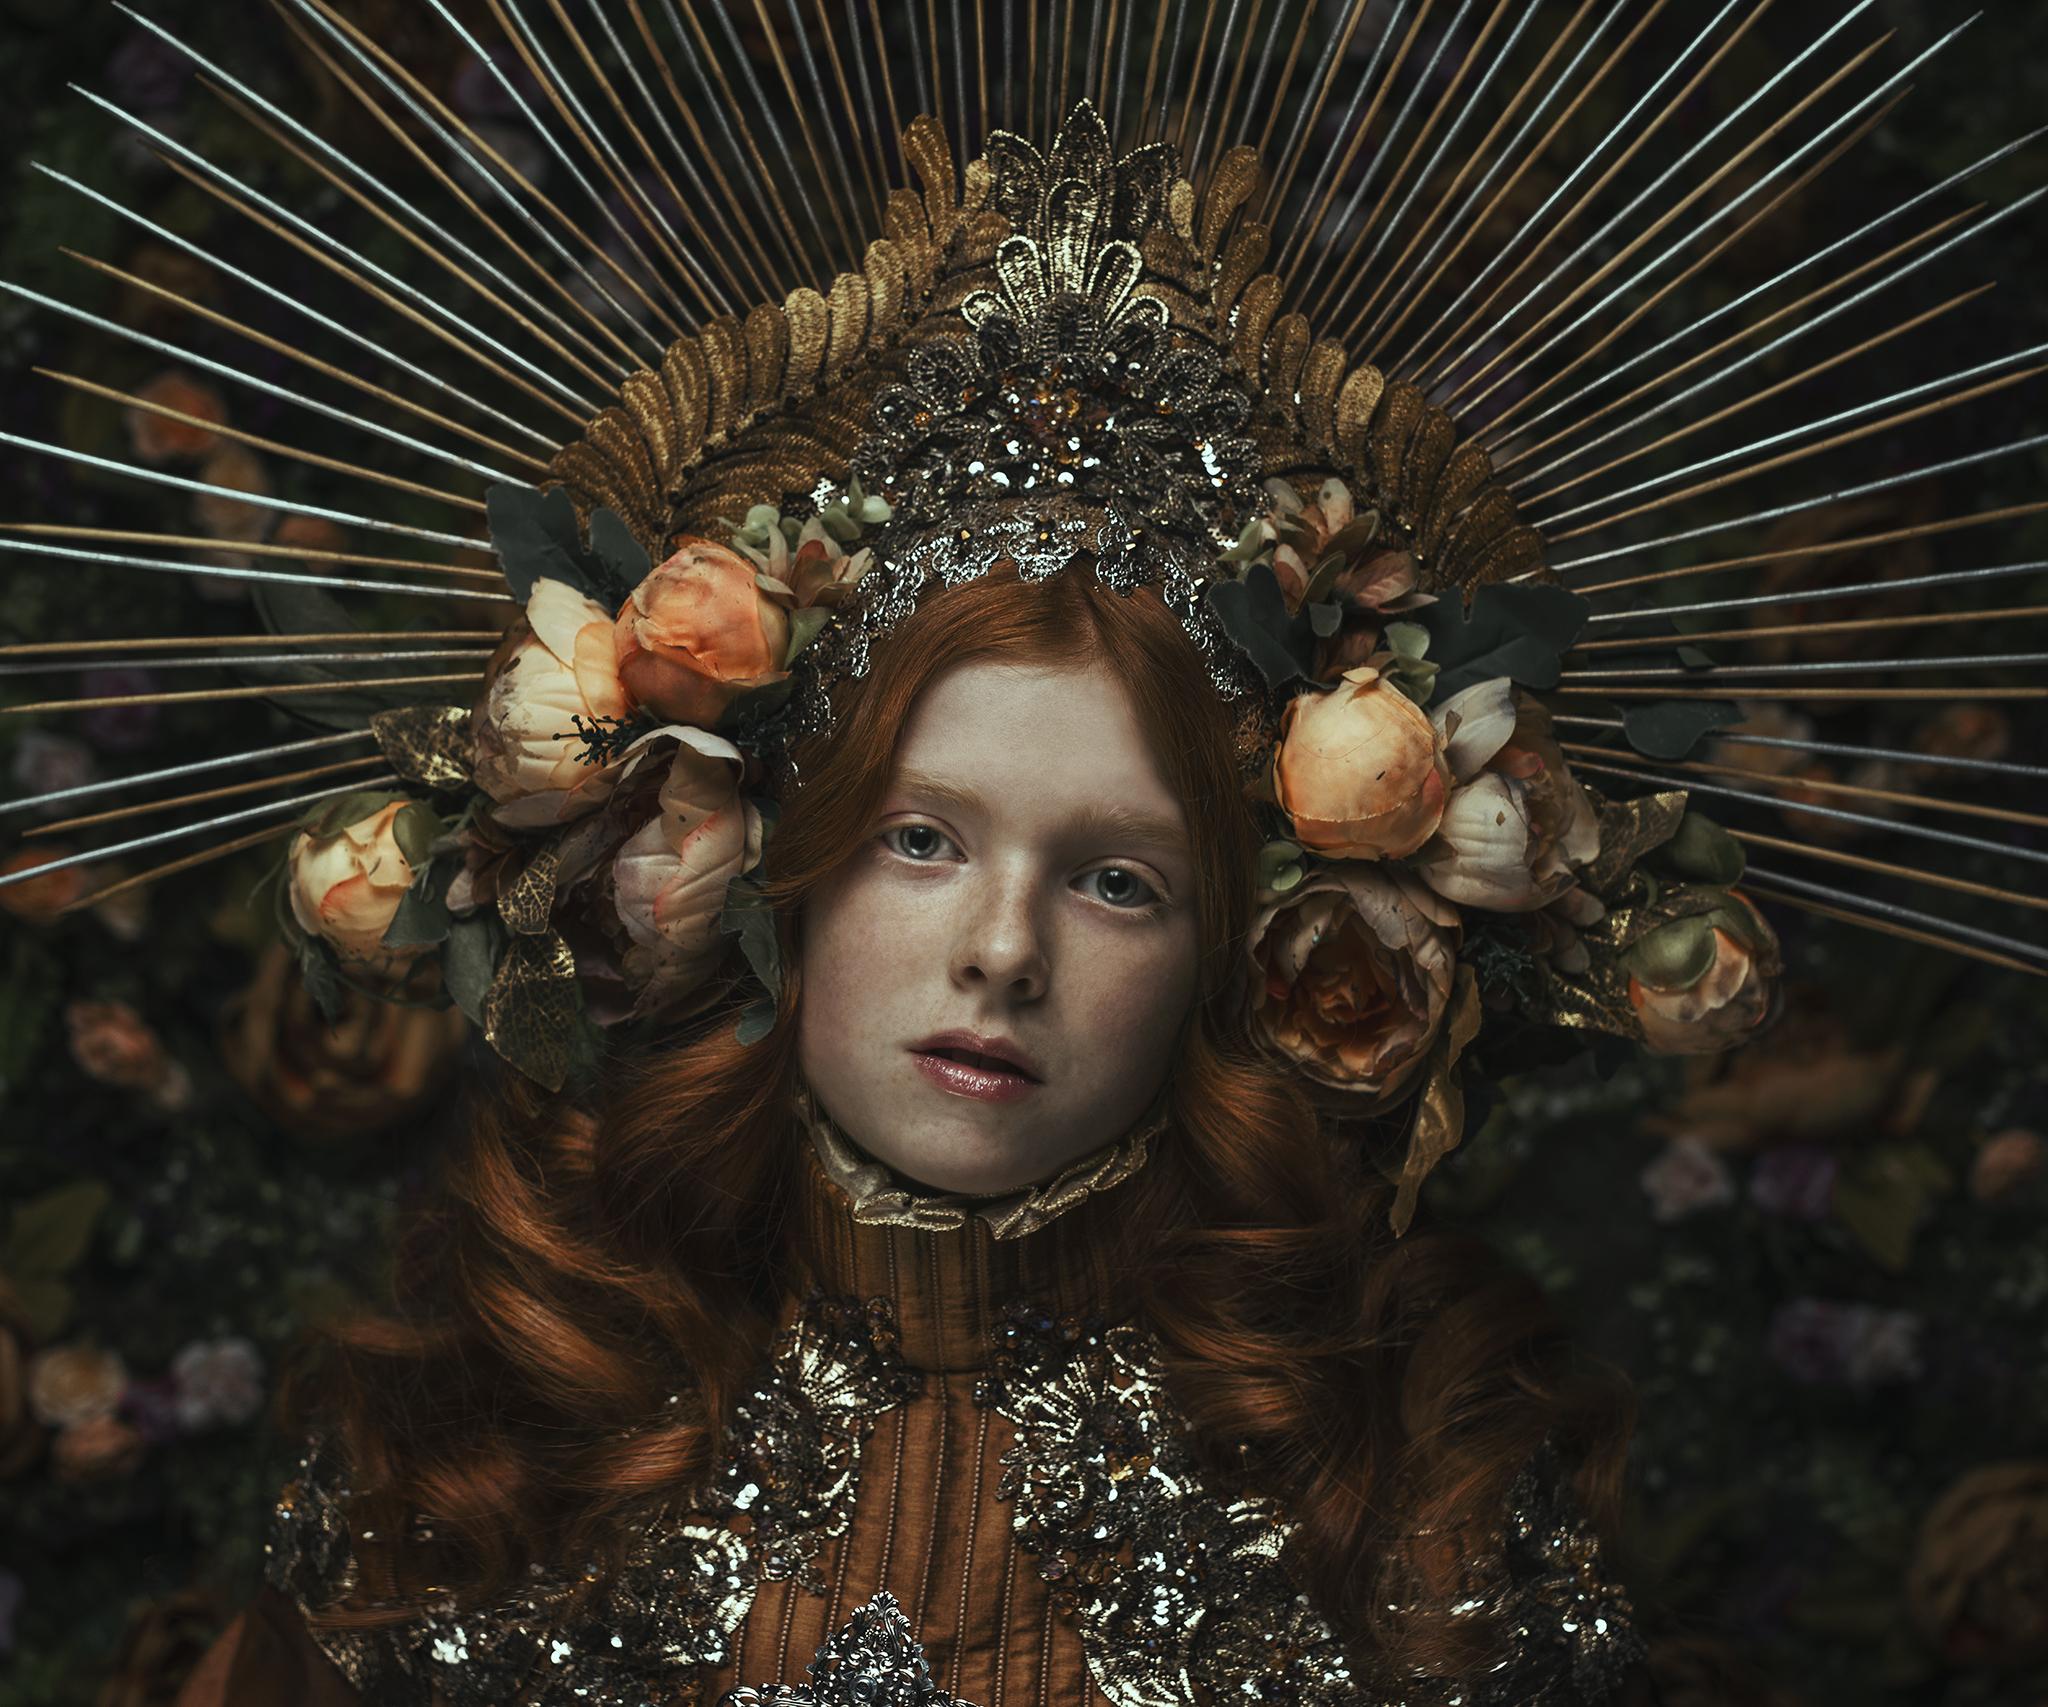 0340_fineart-gloria-girl-young-halo-morkcollective-mikaelaholmberg-mirjamlehtonen-conceptualphotography-costumedesign-crystalchild.jpg